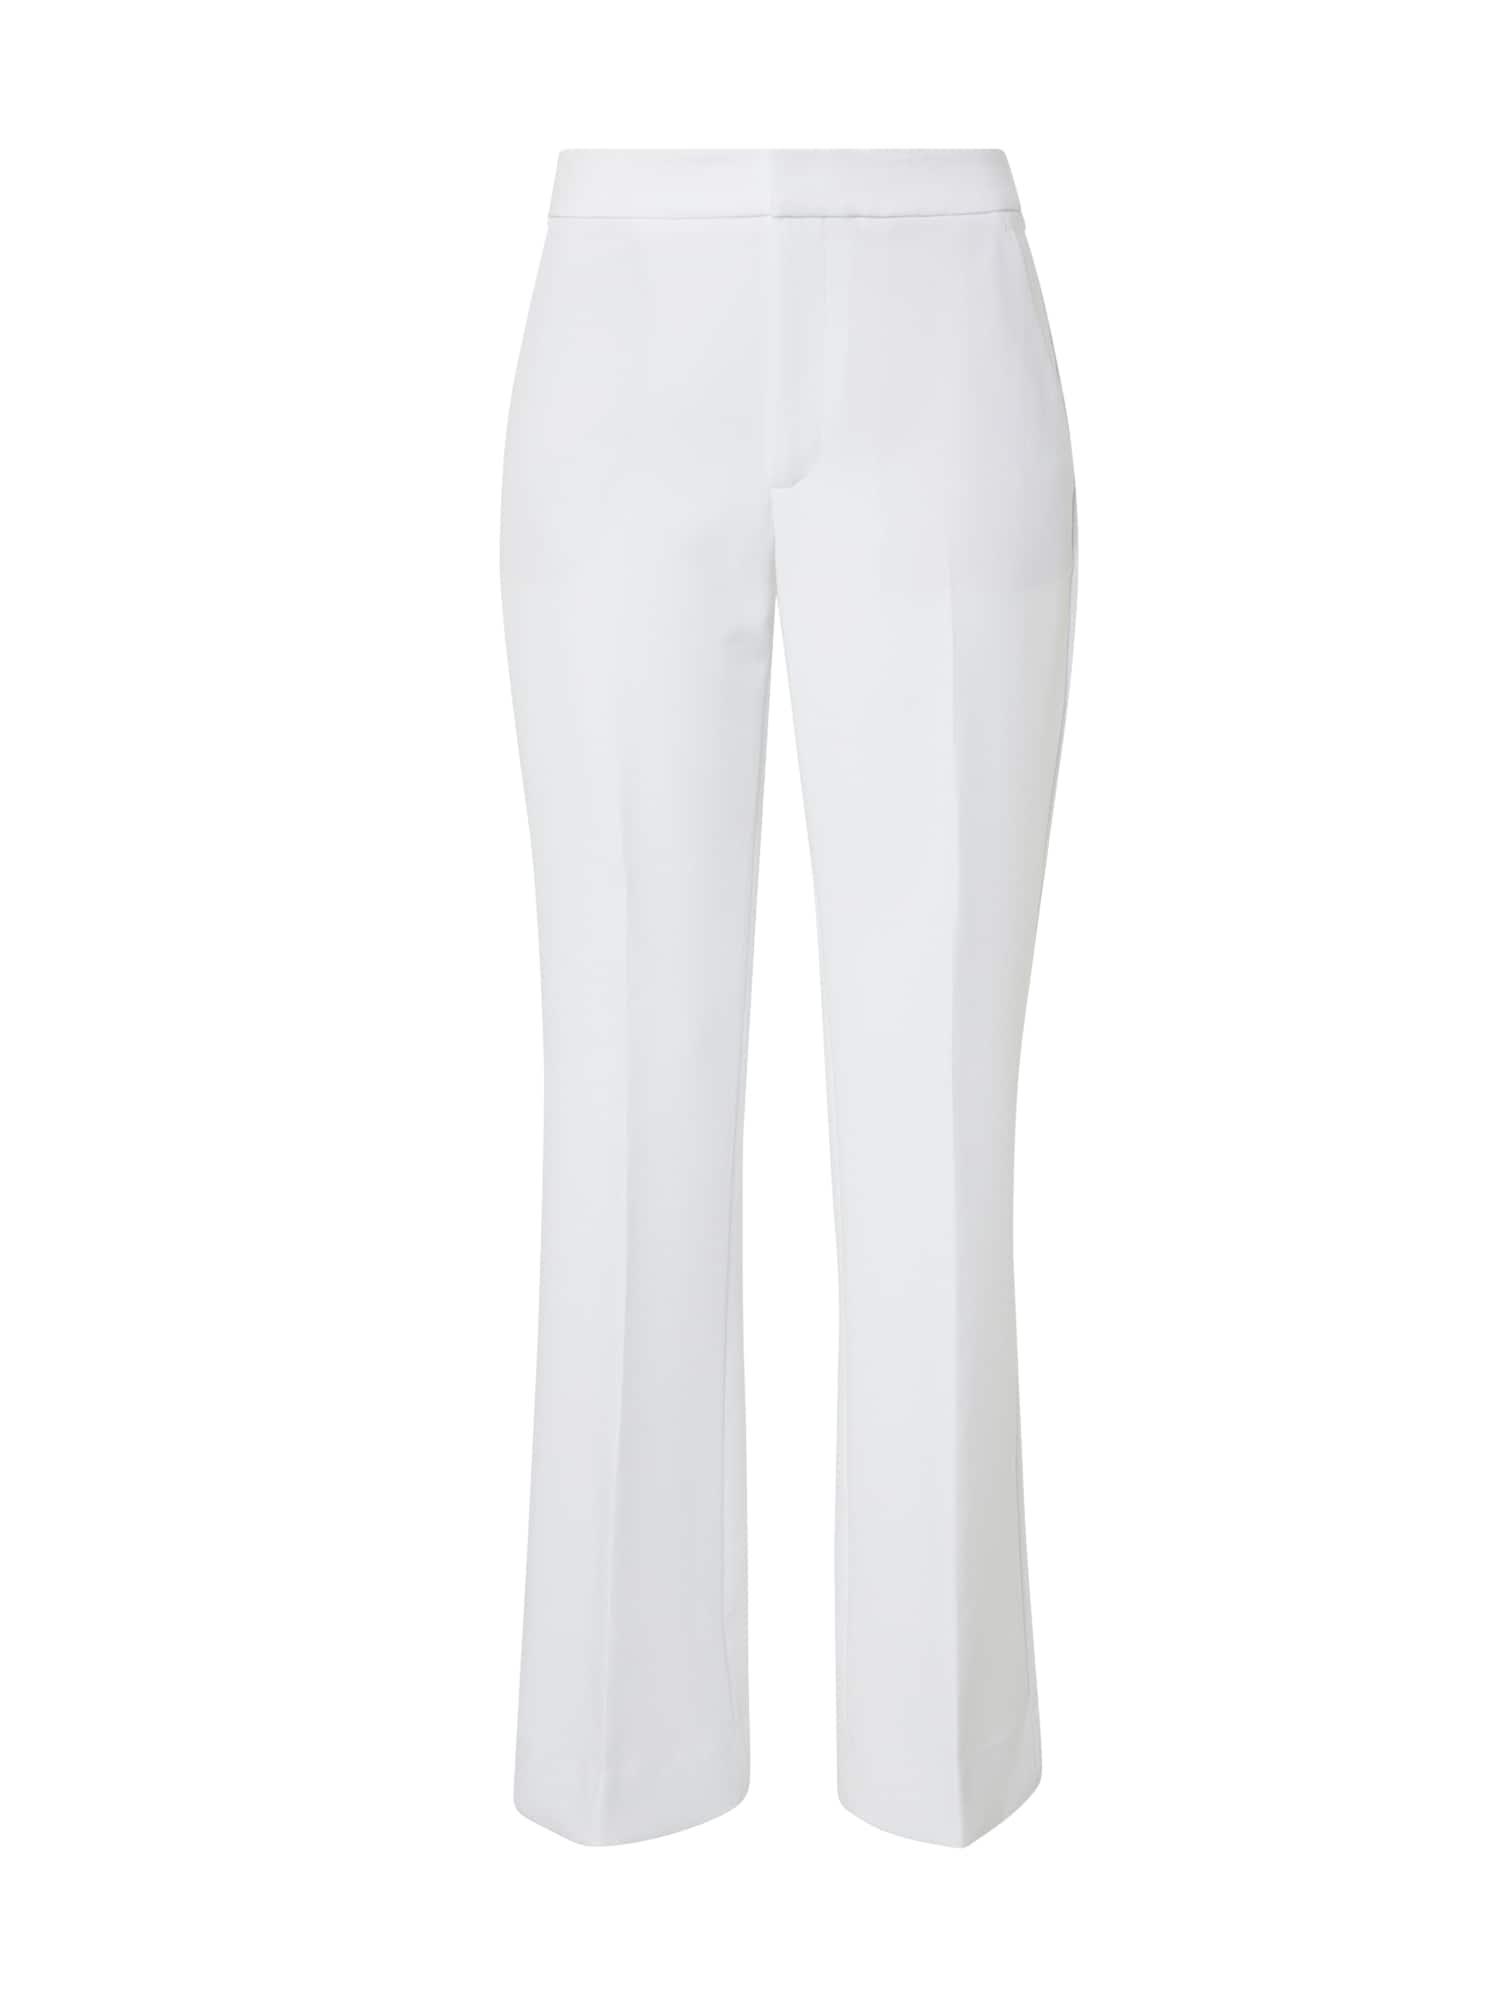 Banana Republic Kelnės su kantu 'SOLIDS' balta